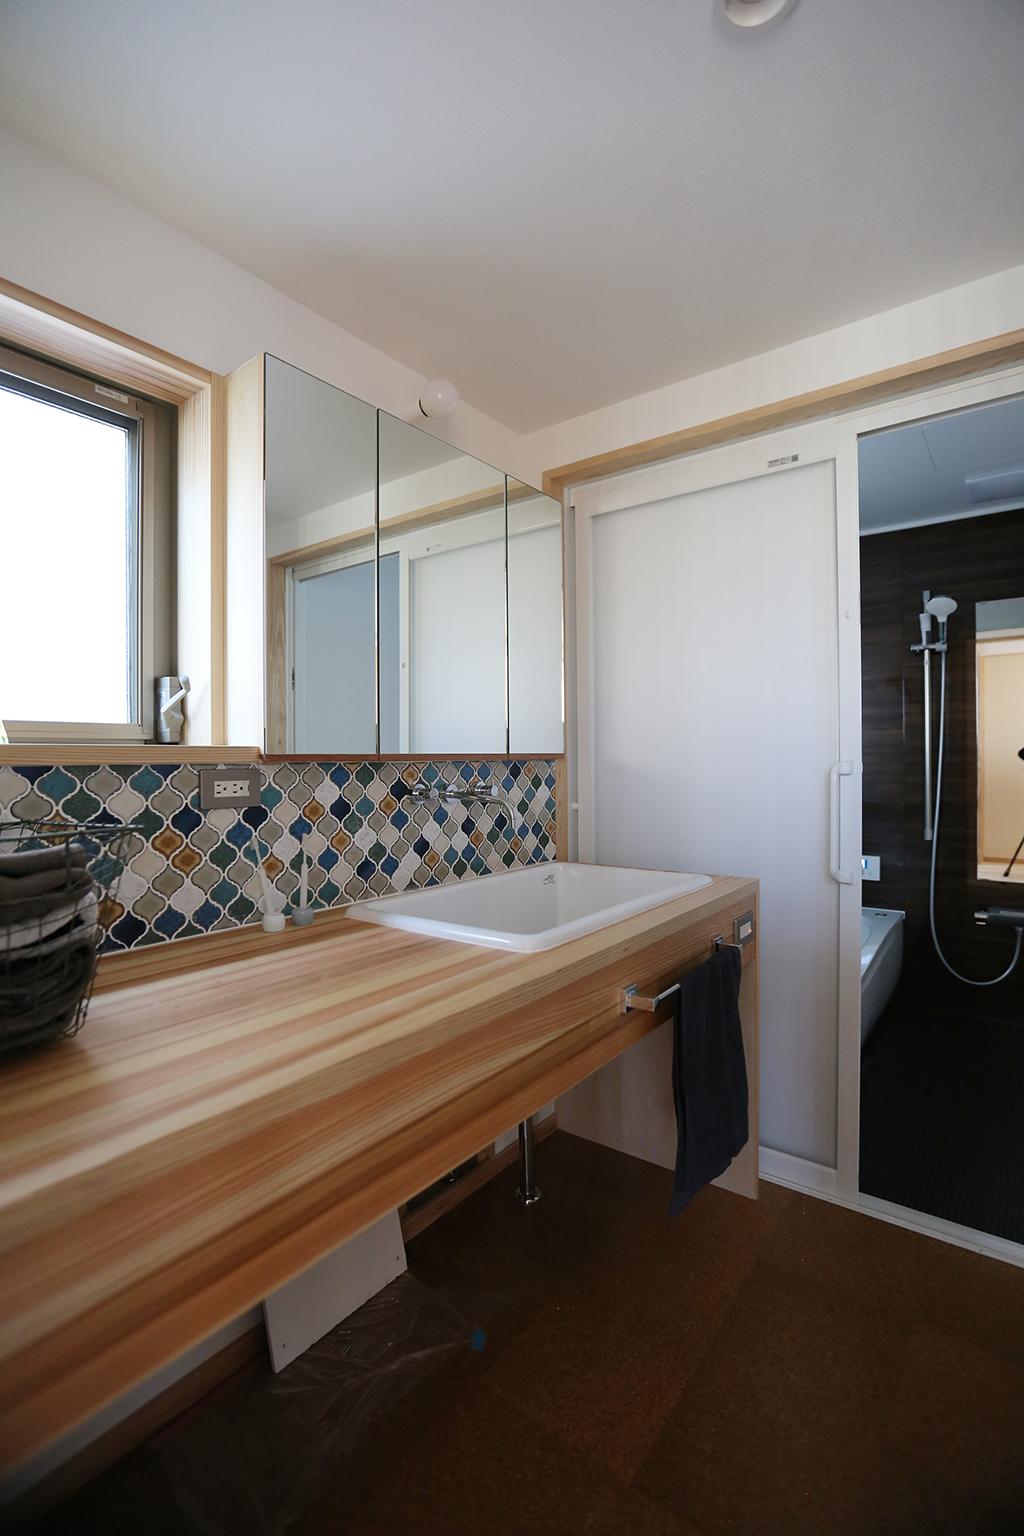 姫路市の木の家 造作洗面台